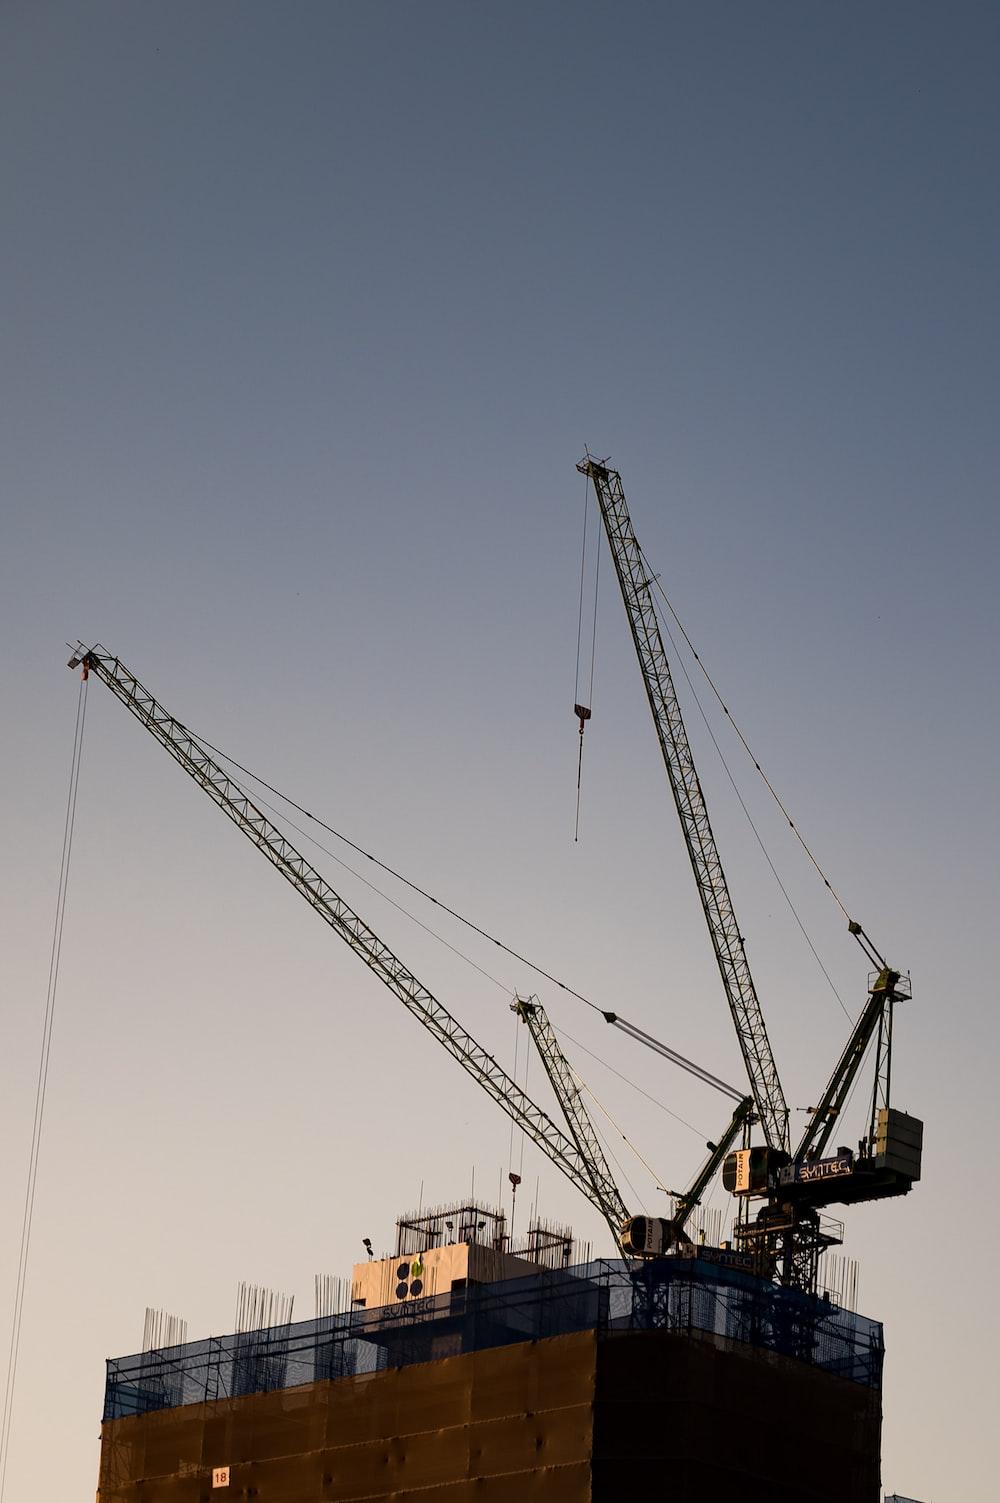 yellow crane under blue sky during daytime